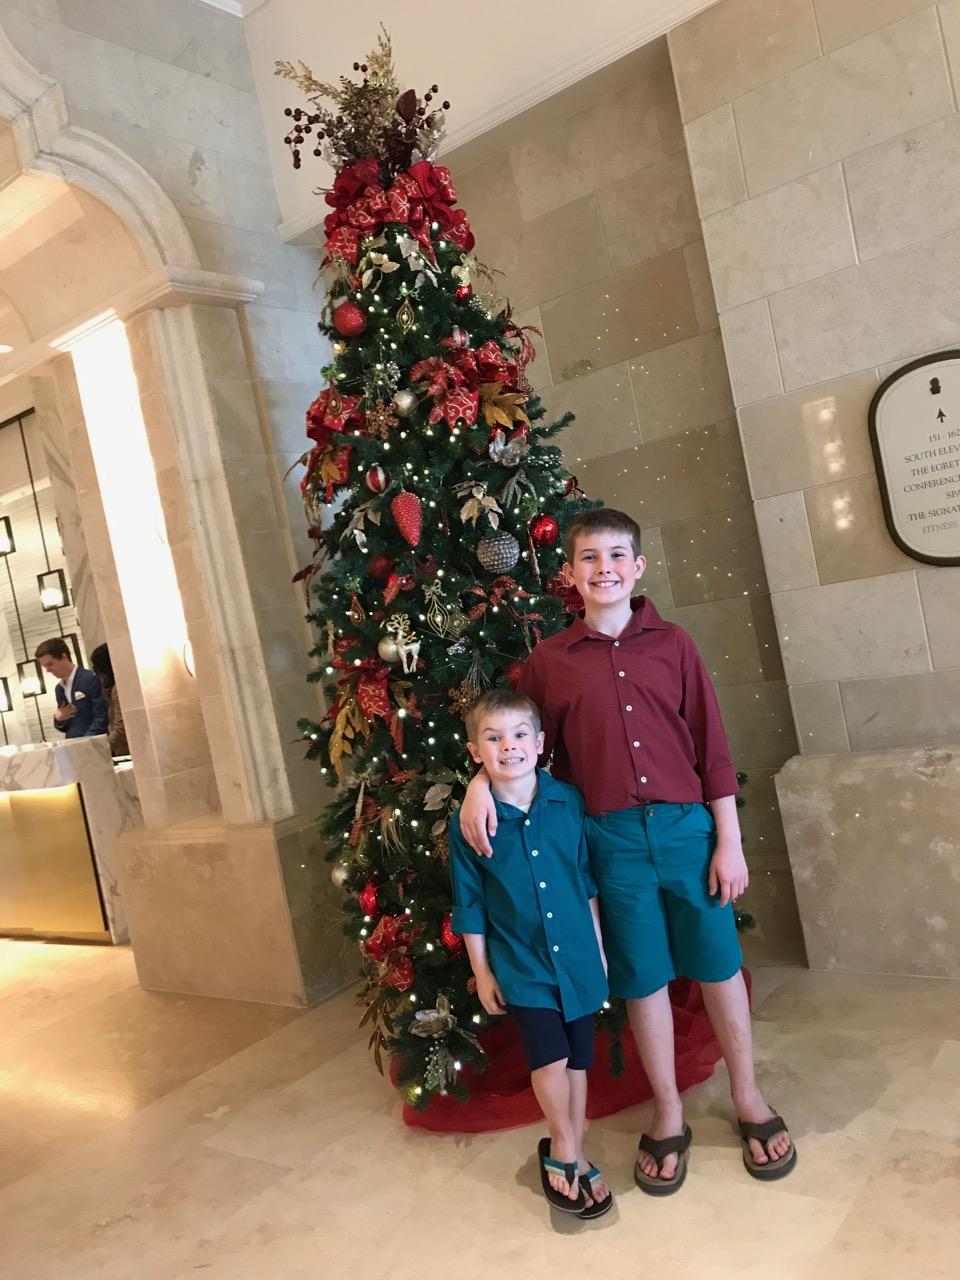 Ritz Carlton Orlando - Holiday Decorations